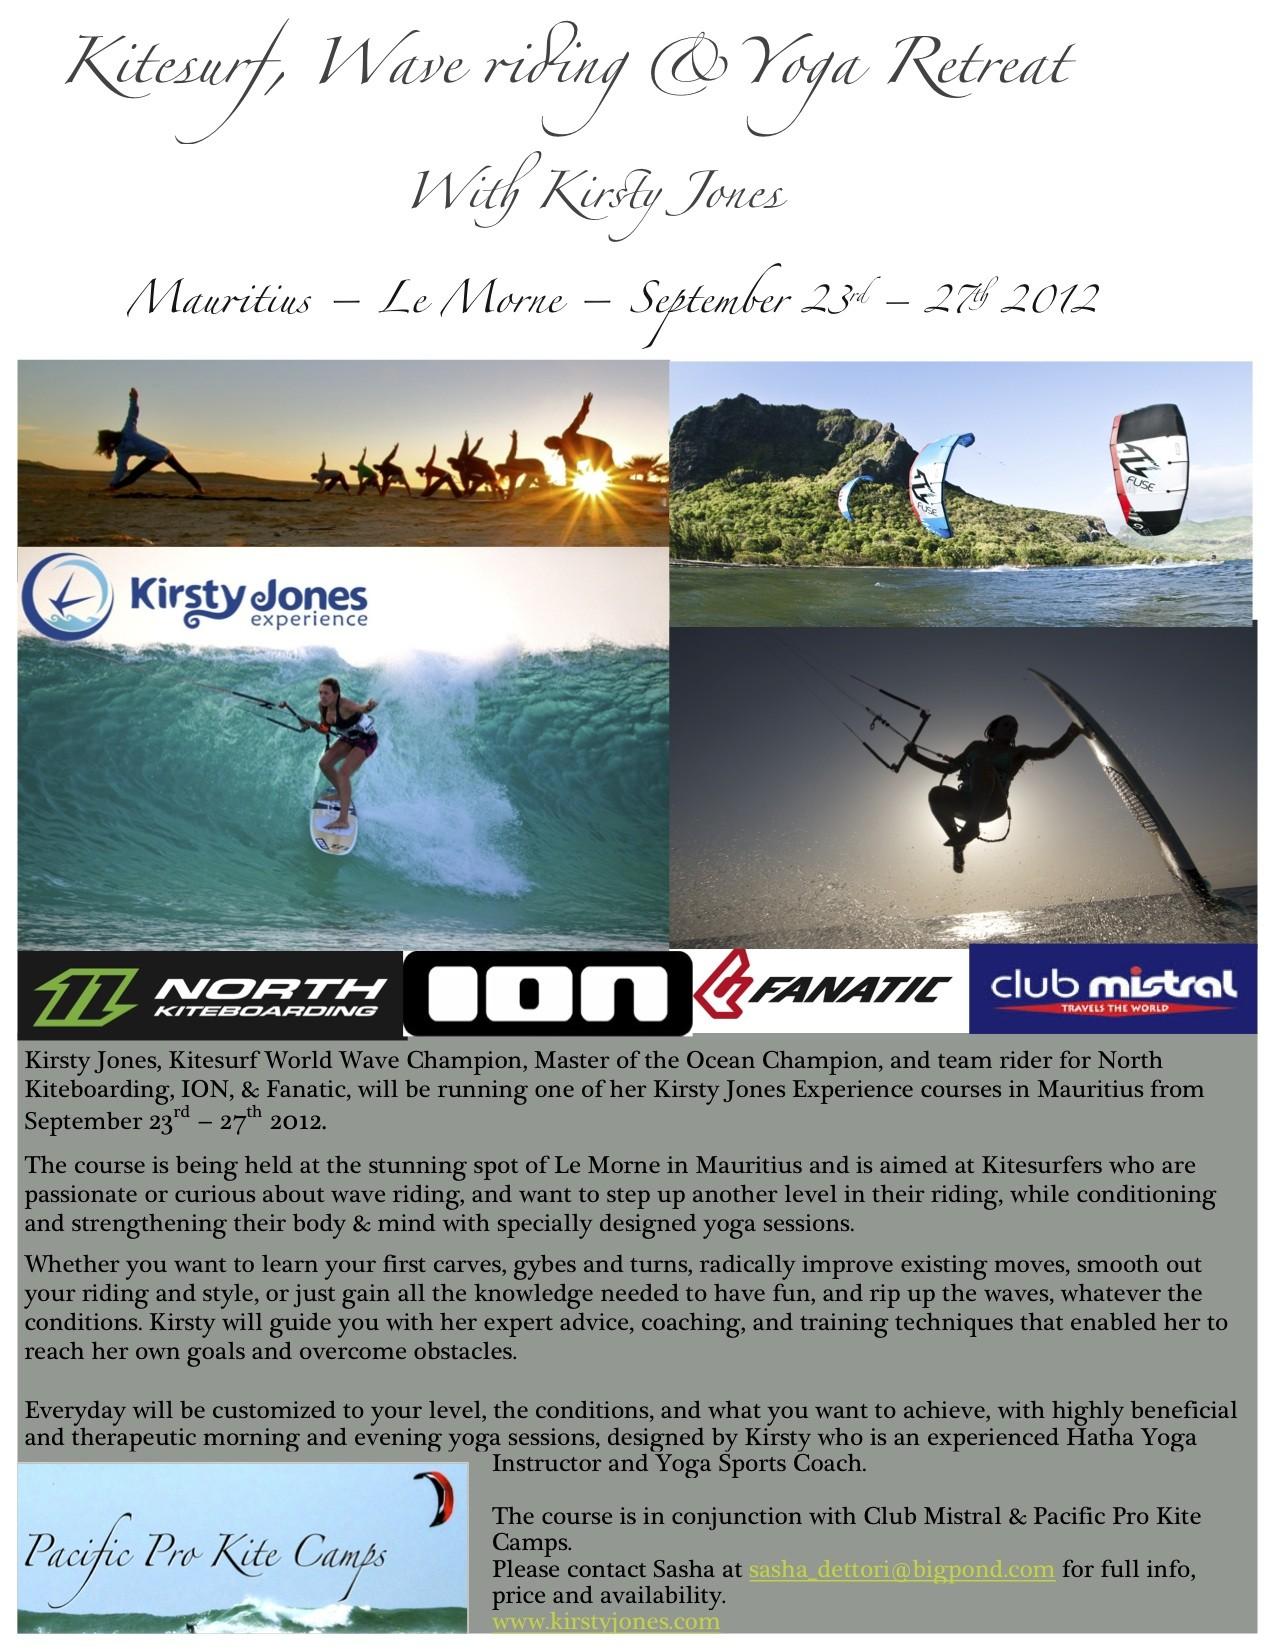 Kirsty Jones Kite, Wave & Yoga Retreat – Mauritius